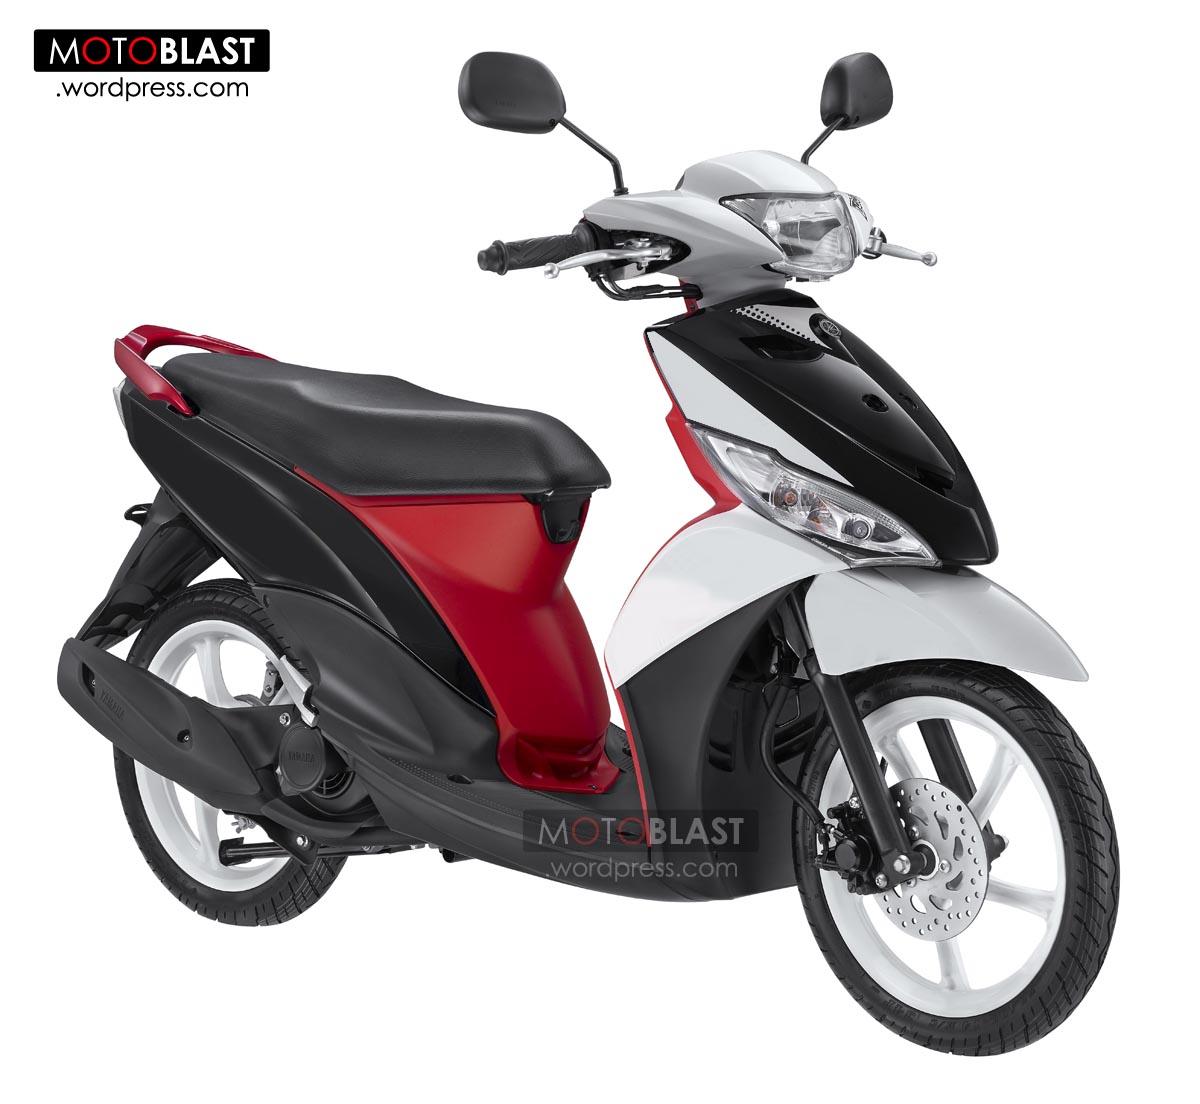 Kumpulan Modifikasi Motor Mio J Warna Merah Terbaru Kampong Motor